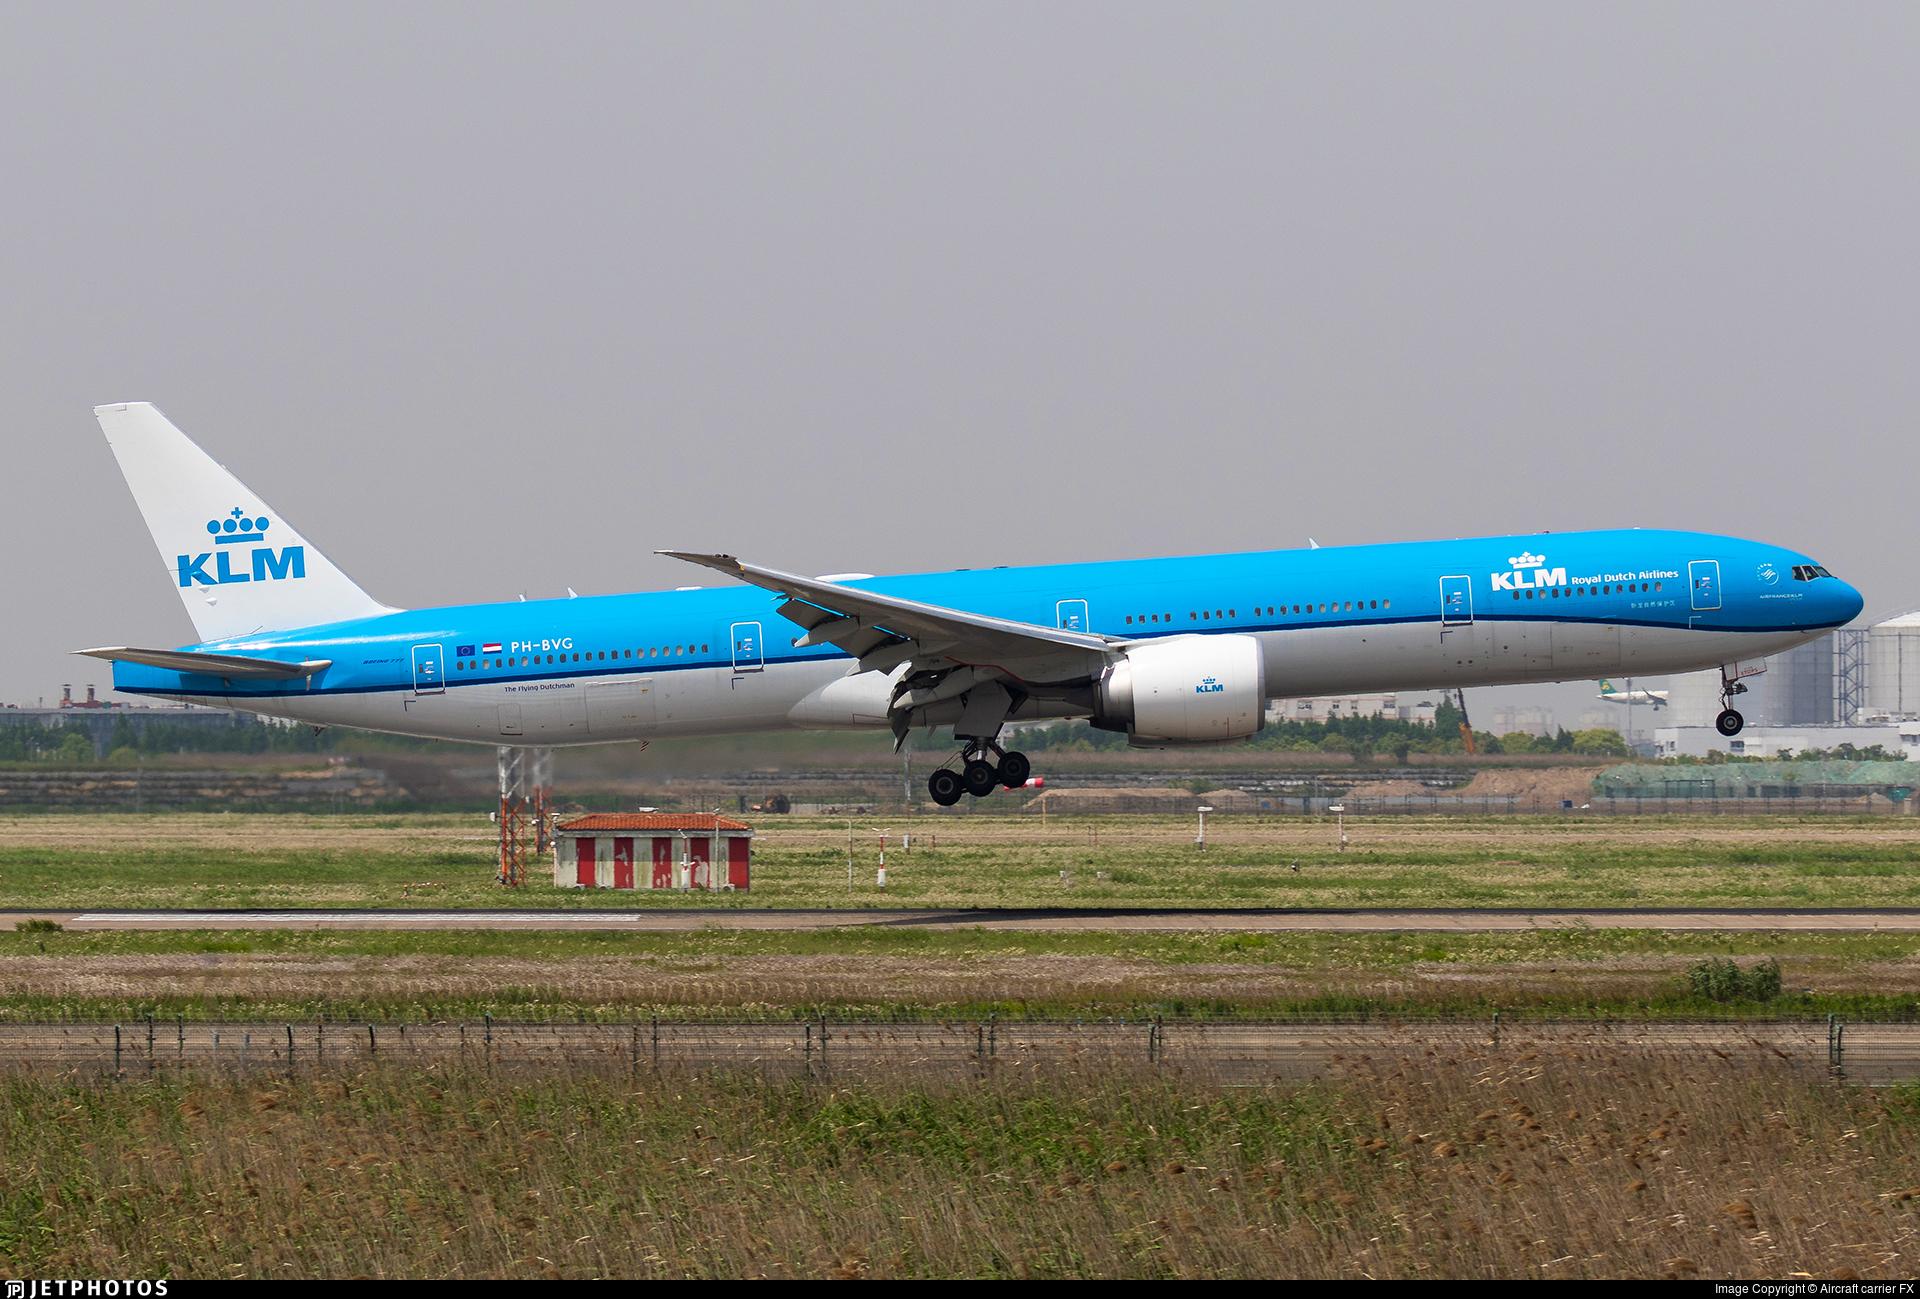 PH-BVG - Boeing 777-306ER - KLM Royal Dutch Airlines